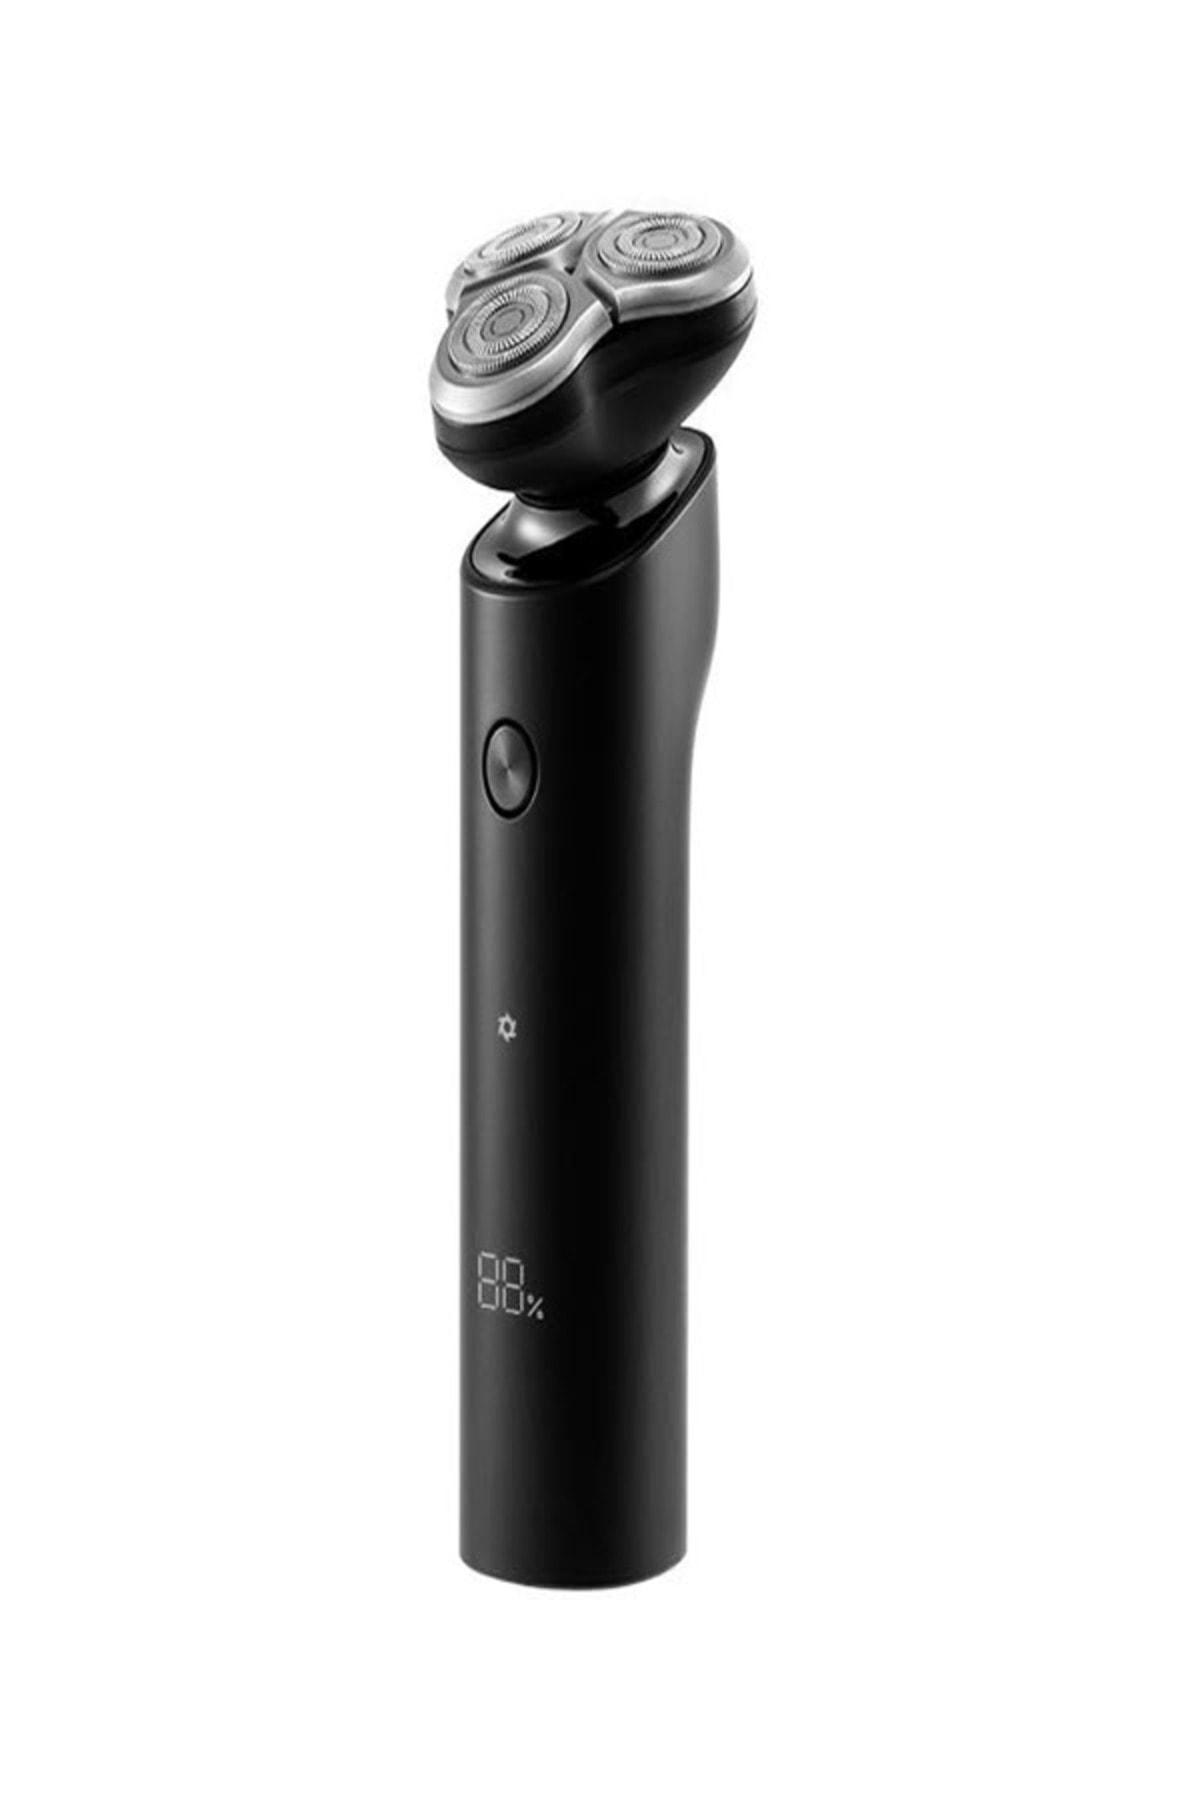 Xiaomi Mijia Elektrikli Tıraş Makinesi S500 Siyah 1